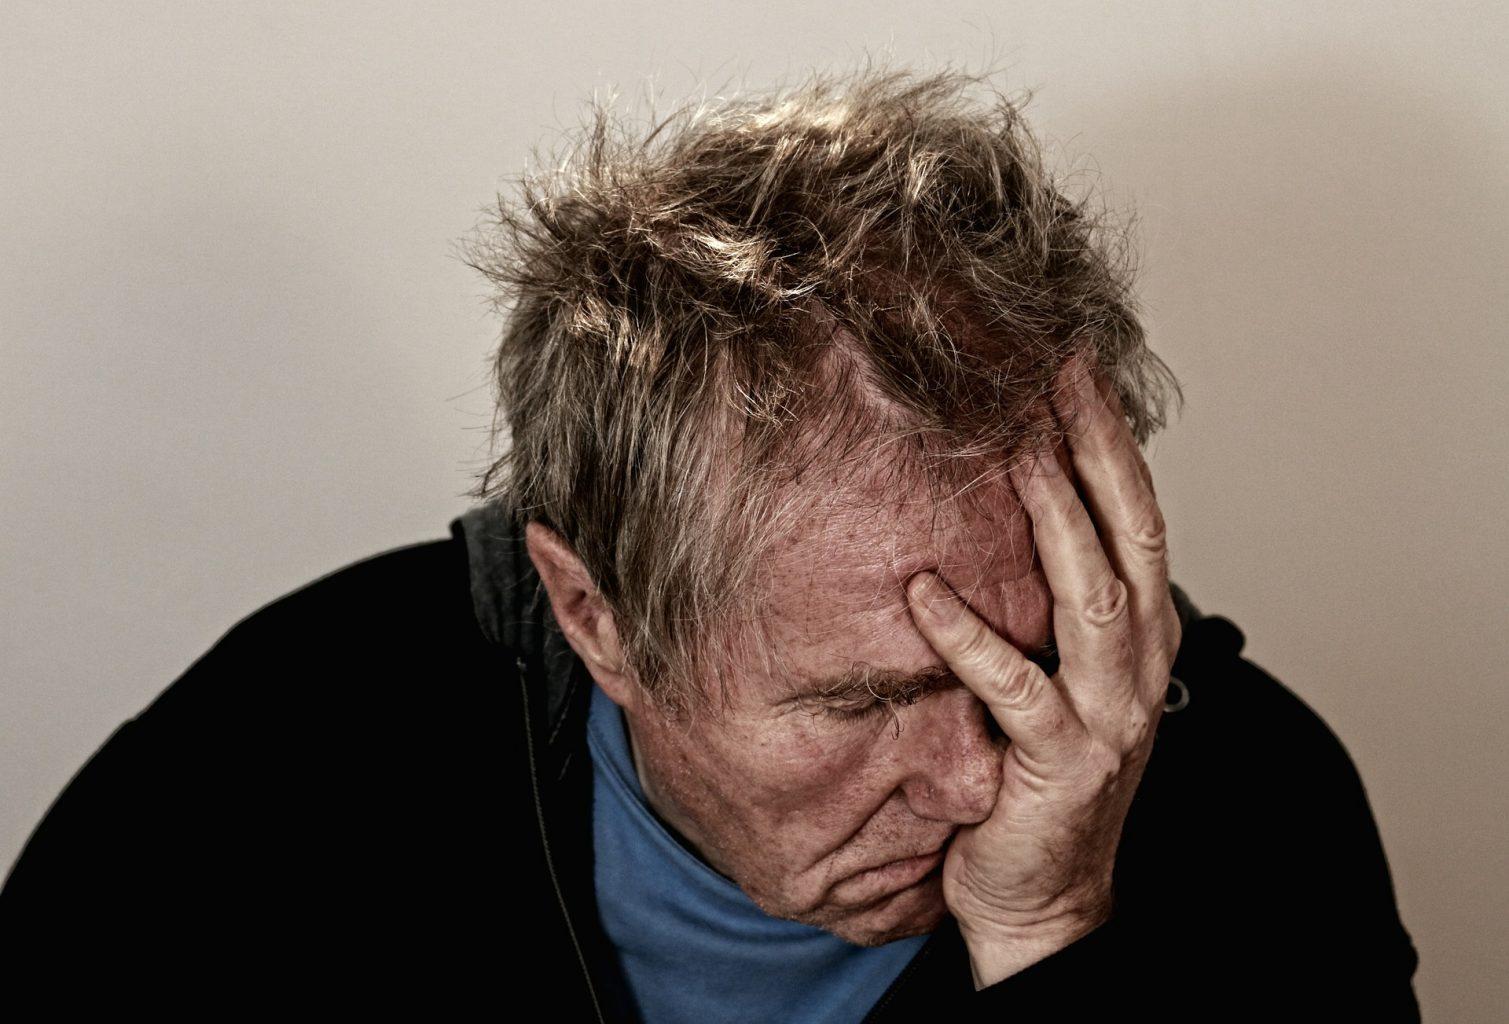 Cefalea tensional dolor de cabeza